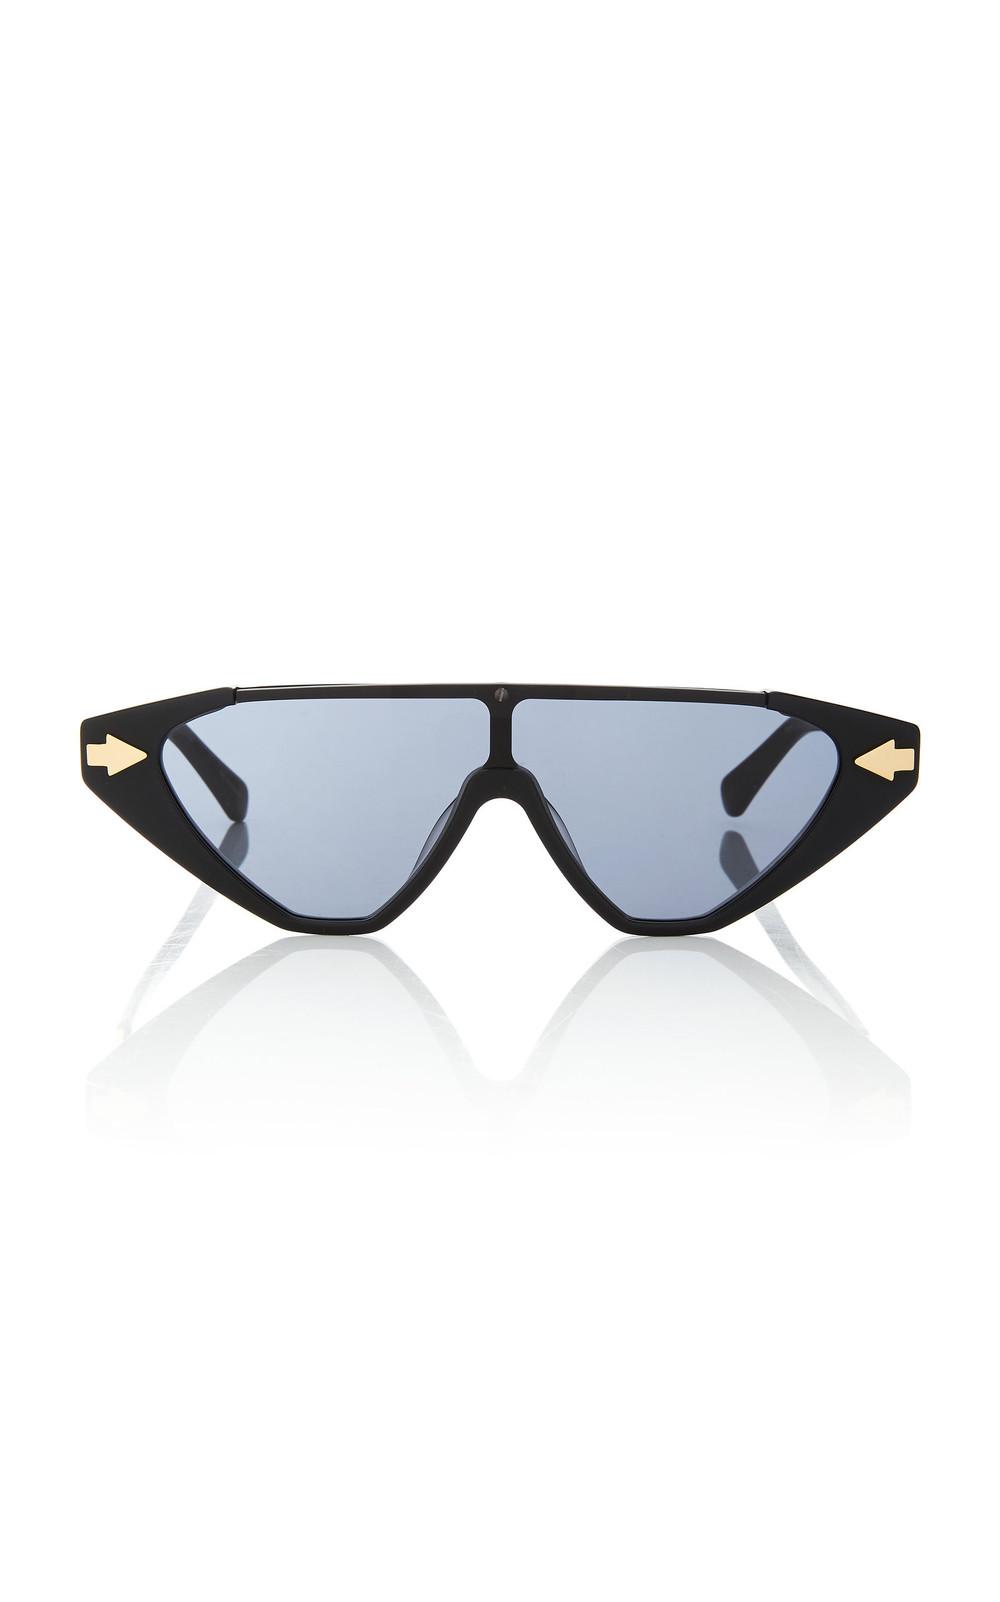 Karen Walker Hallelujah Aviator-Style Acetate Sunglasses in black